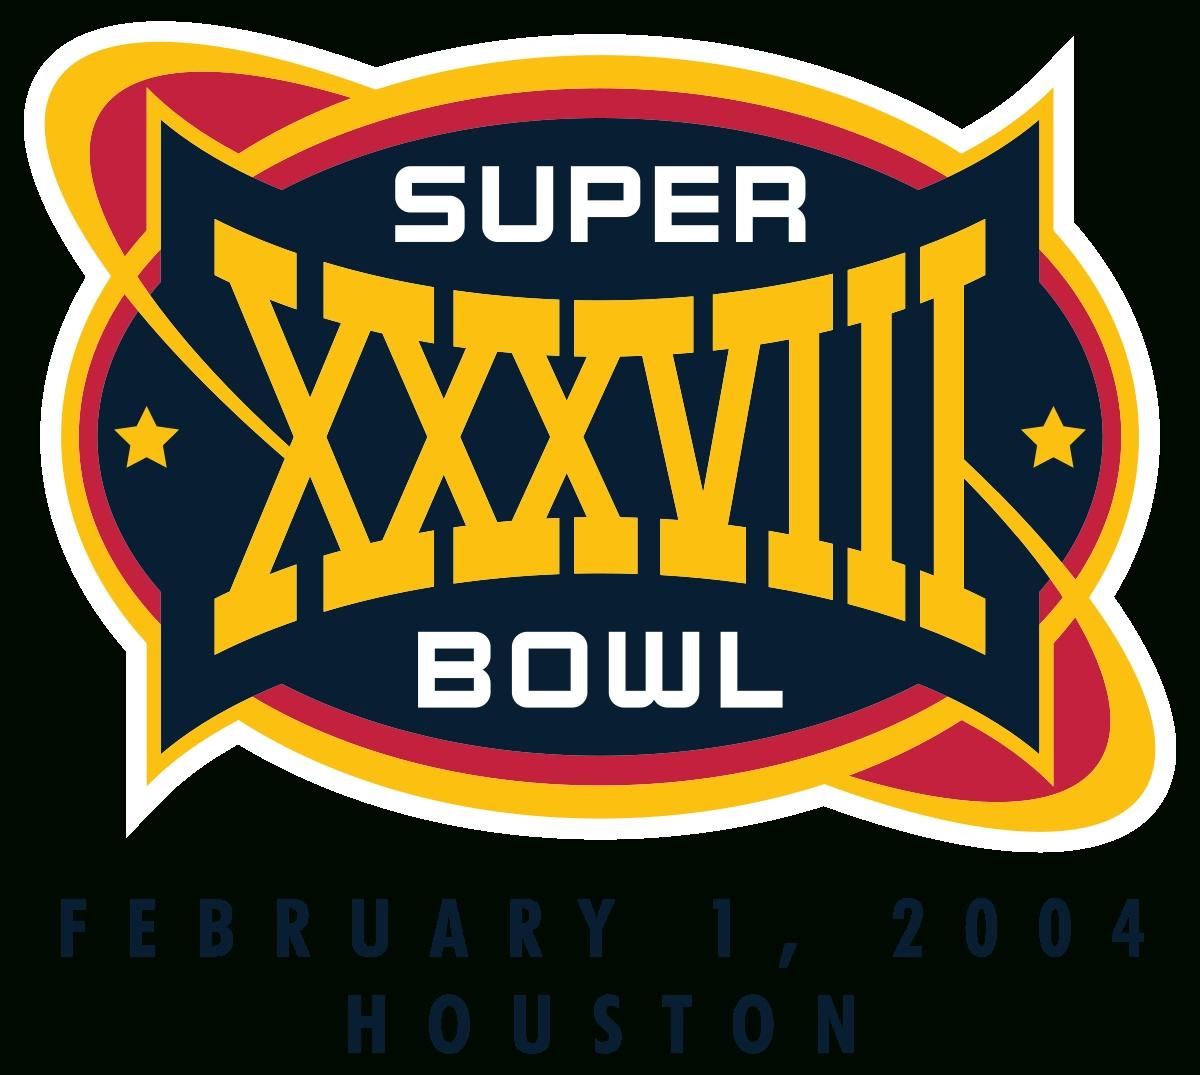 Super Bowl Xxxviii - Wikipedia inside Super Bowl 53 Mvp Vote Text Number